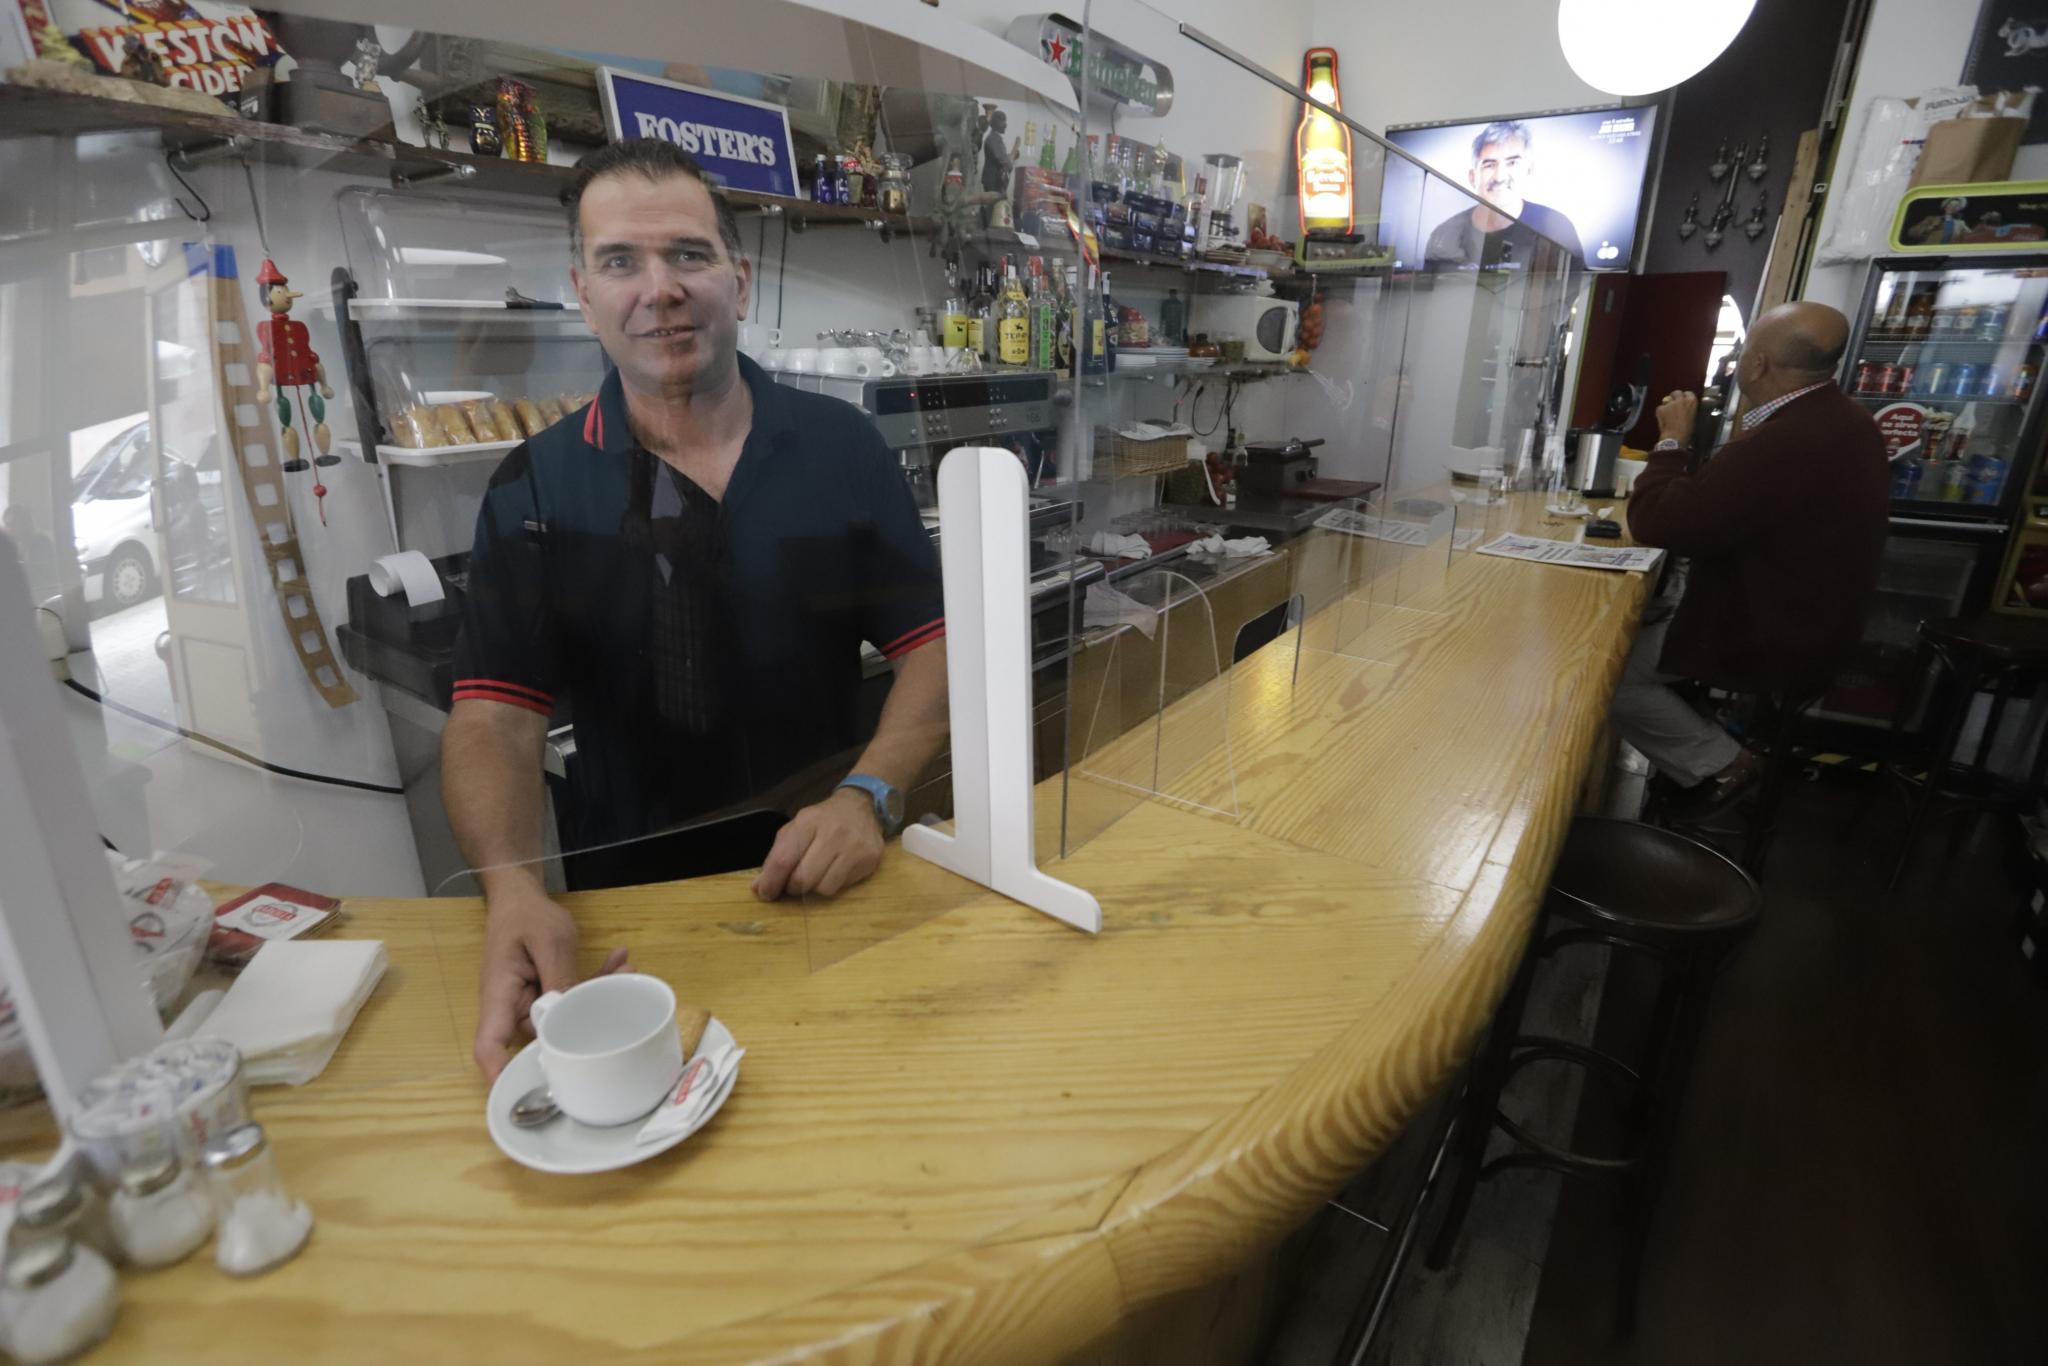 A waiter serving a coffee